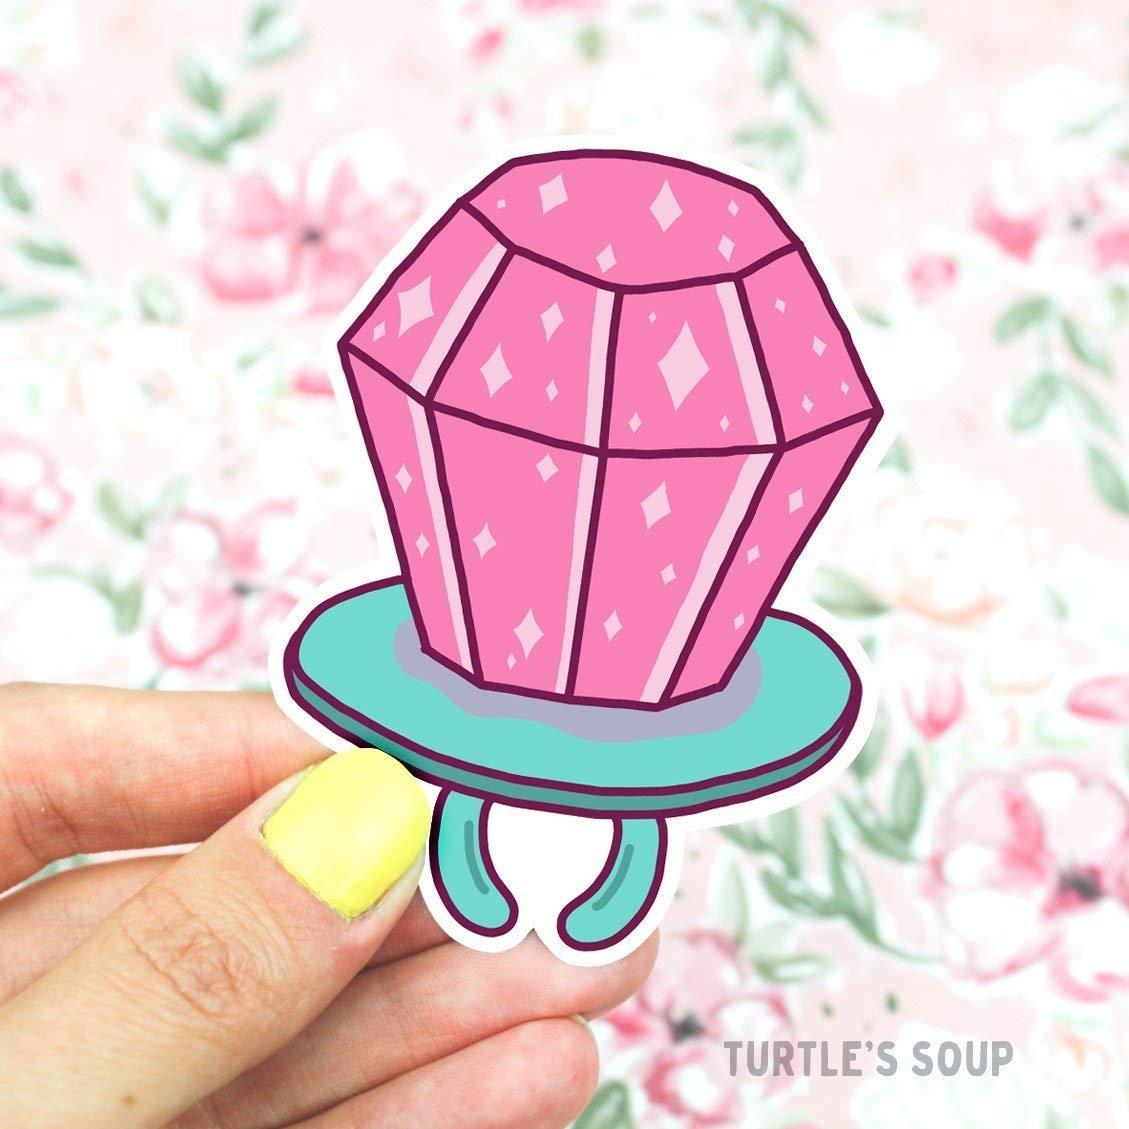 Amazon com ring pop sticker 90s decal laptop sticker vaporwave tumbler decal sugar decal ringpop candy sticker feminine pink girly sticker